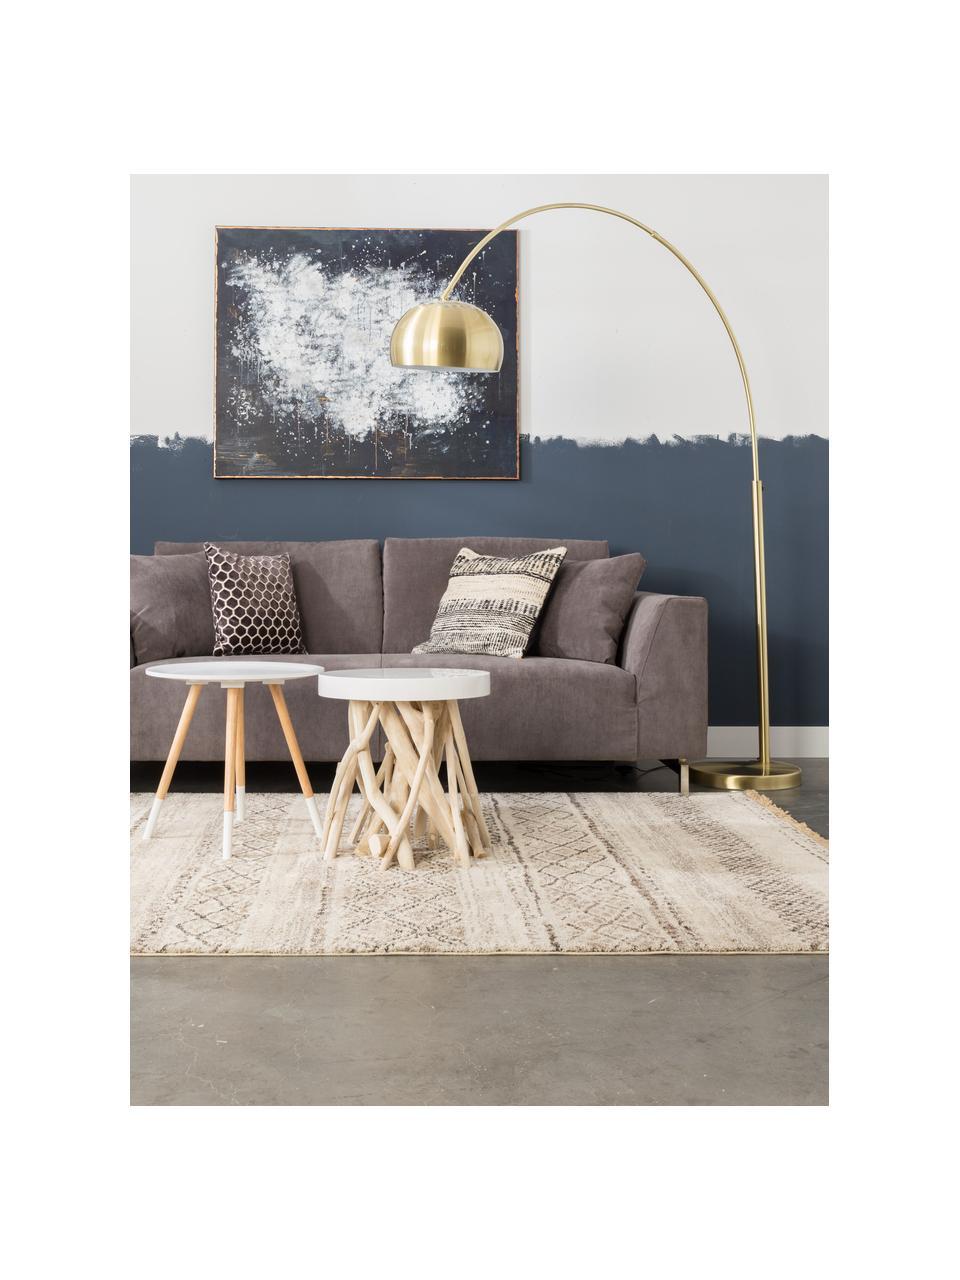 Große Bogenlampe Metal Bow in Messing, Lampenschirm: Metall, vermessingt, Gestell: Metall, vermessingt, Lampenfuß: Stein mit vermessingter M, Messingfarben, 170 x 205 cm